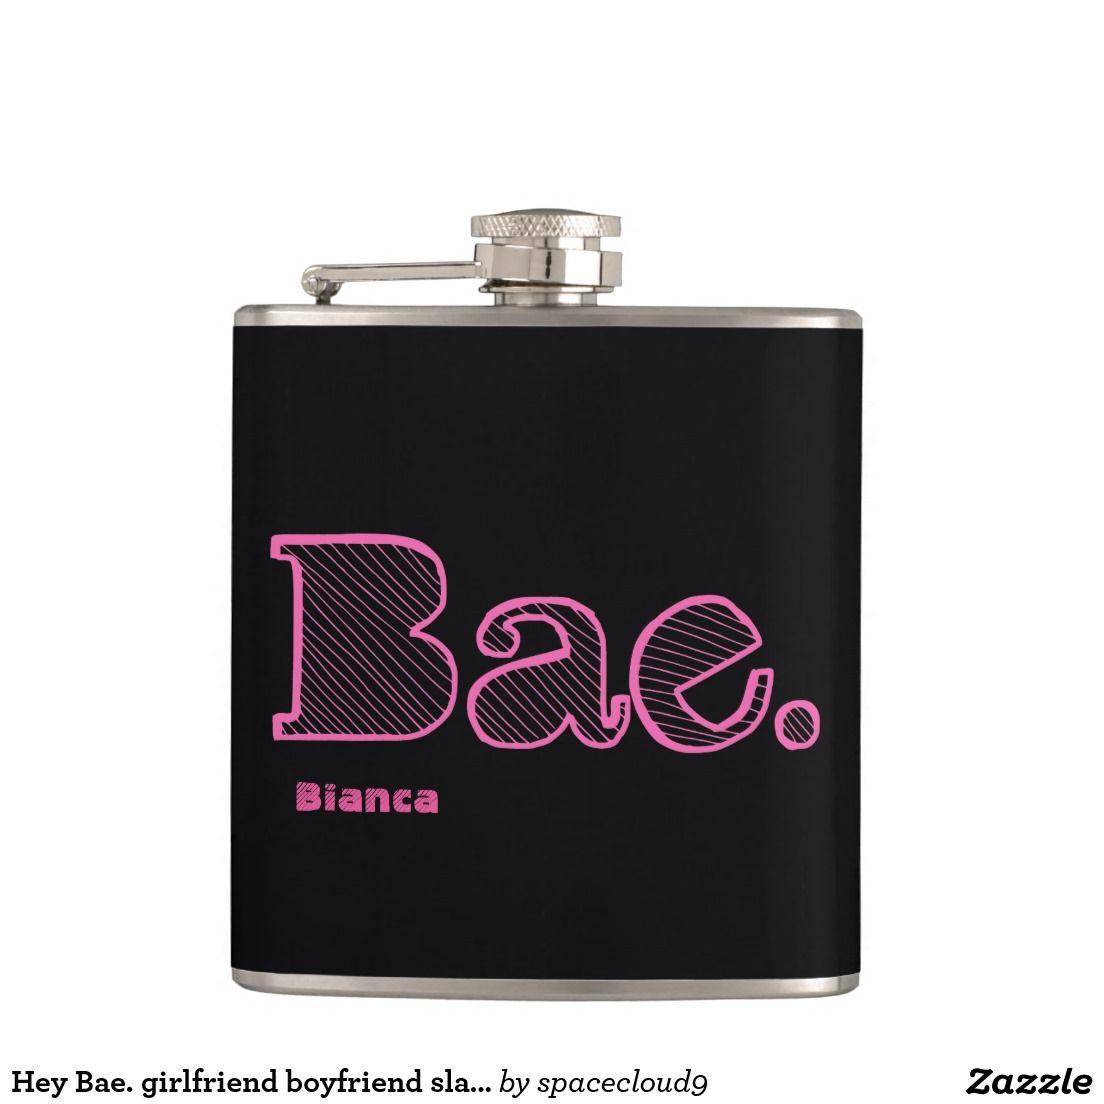 Bae Text slang